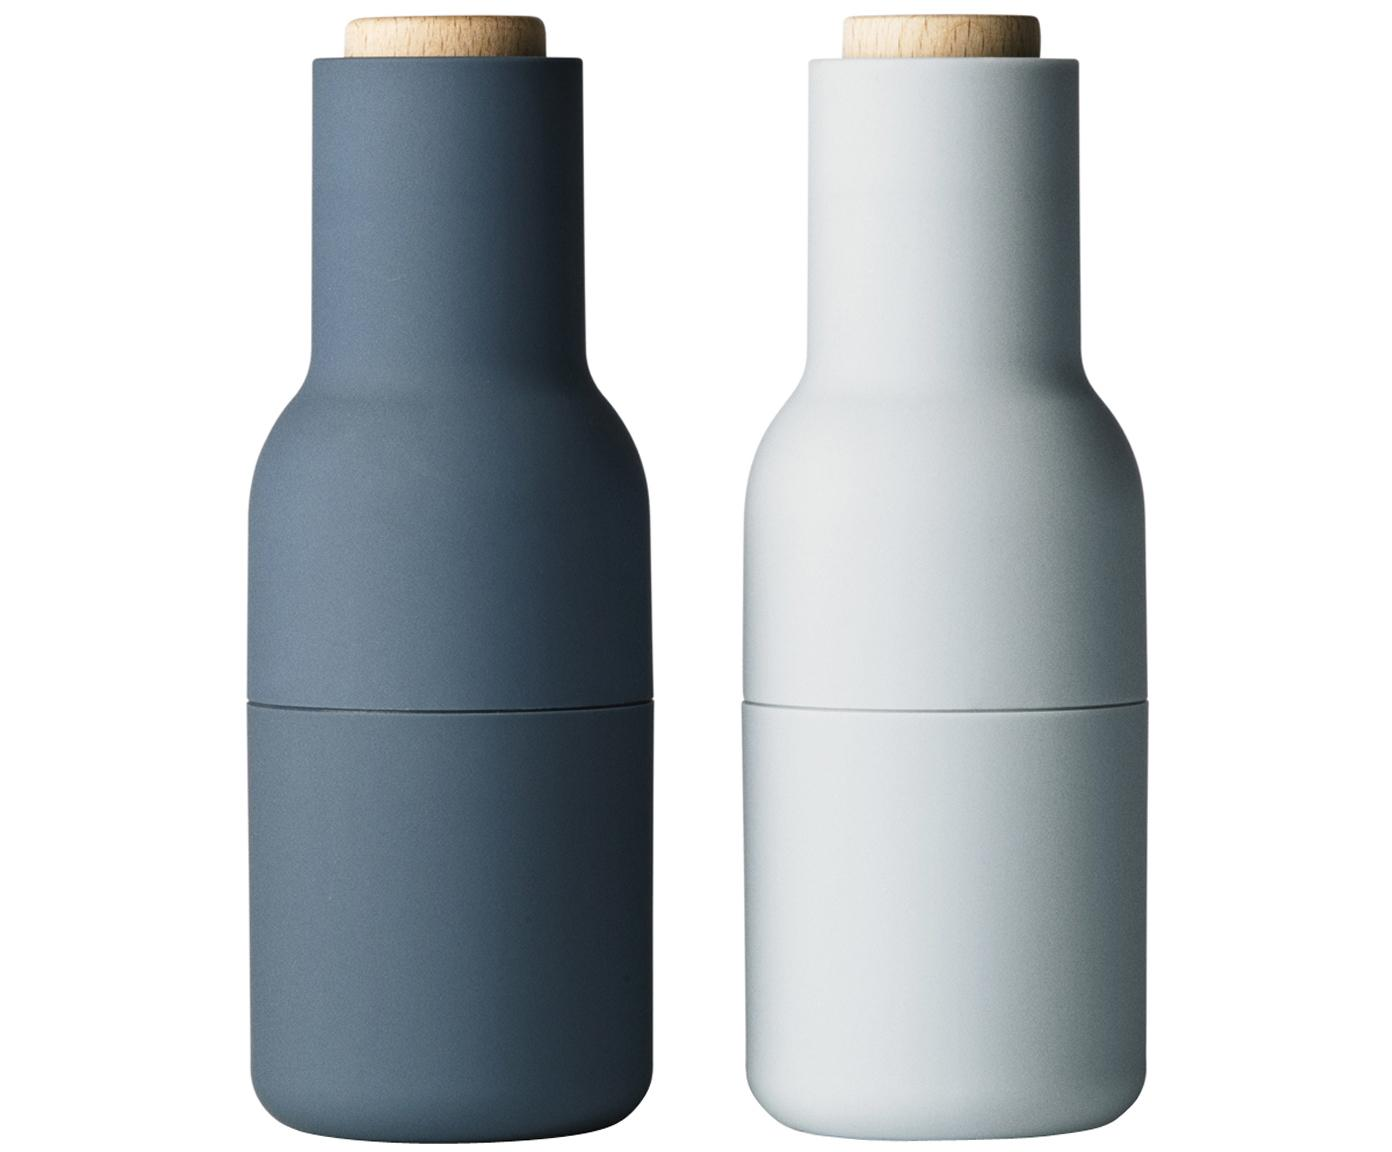 Peper- en zoutmolen Bottle Grinder, 2-delig, Frame: kunststof, Deksel: hout, Blauw, lichtblauw, bruin, Ø 8 x H 21 cm